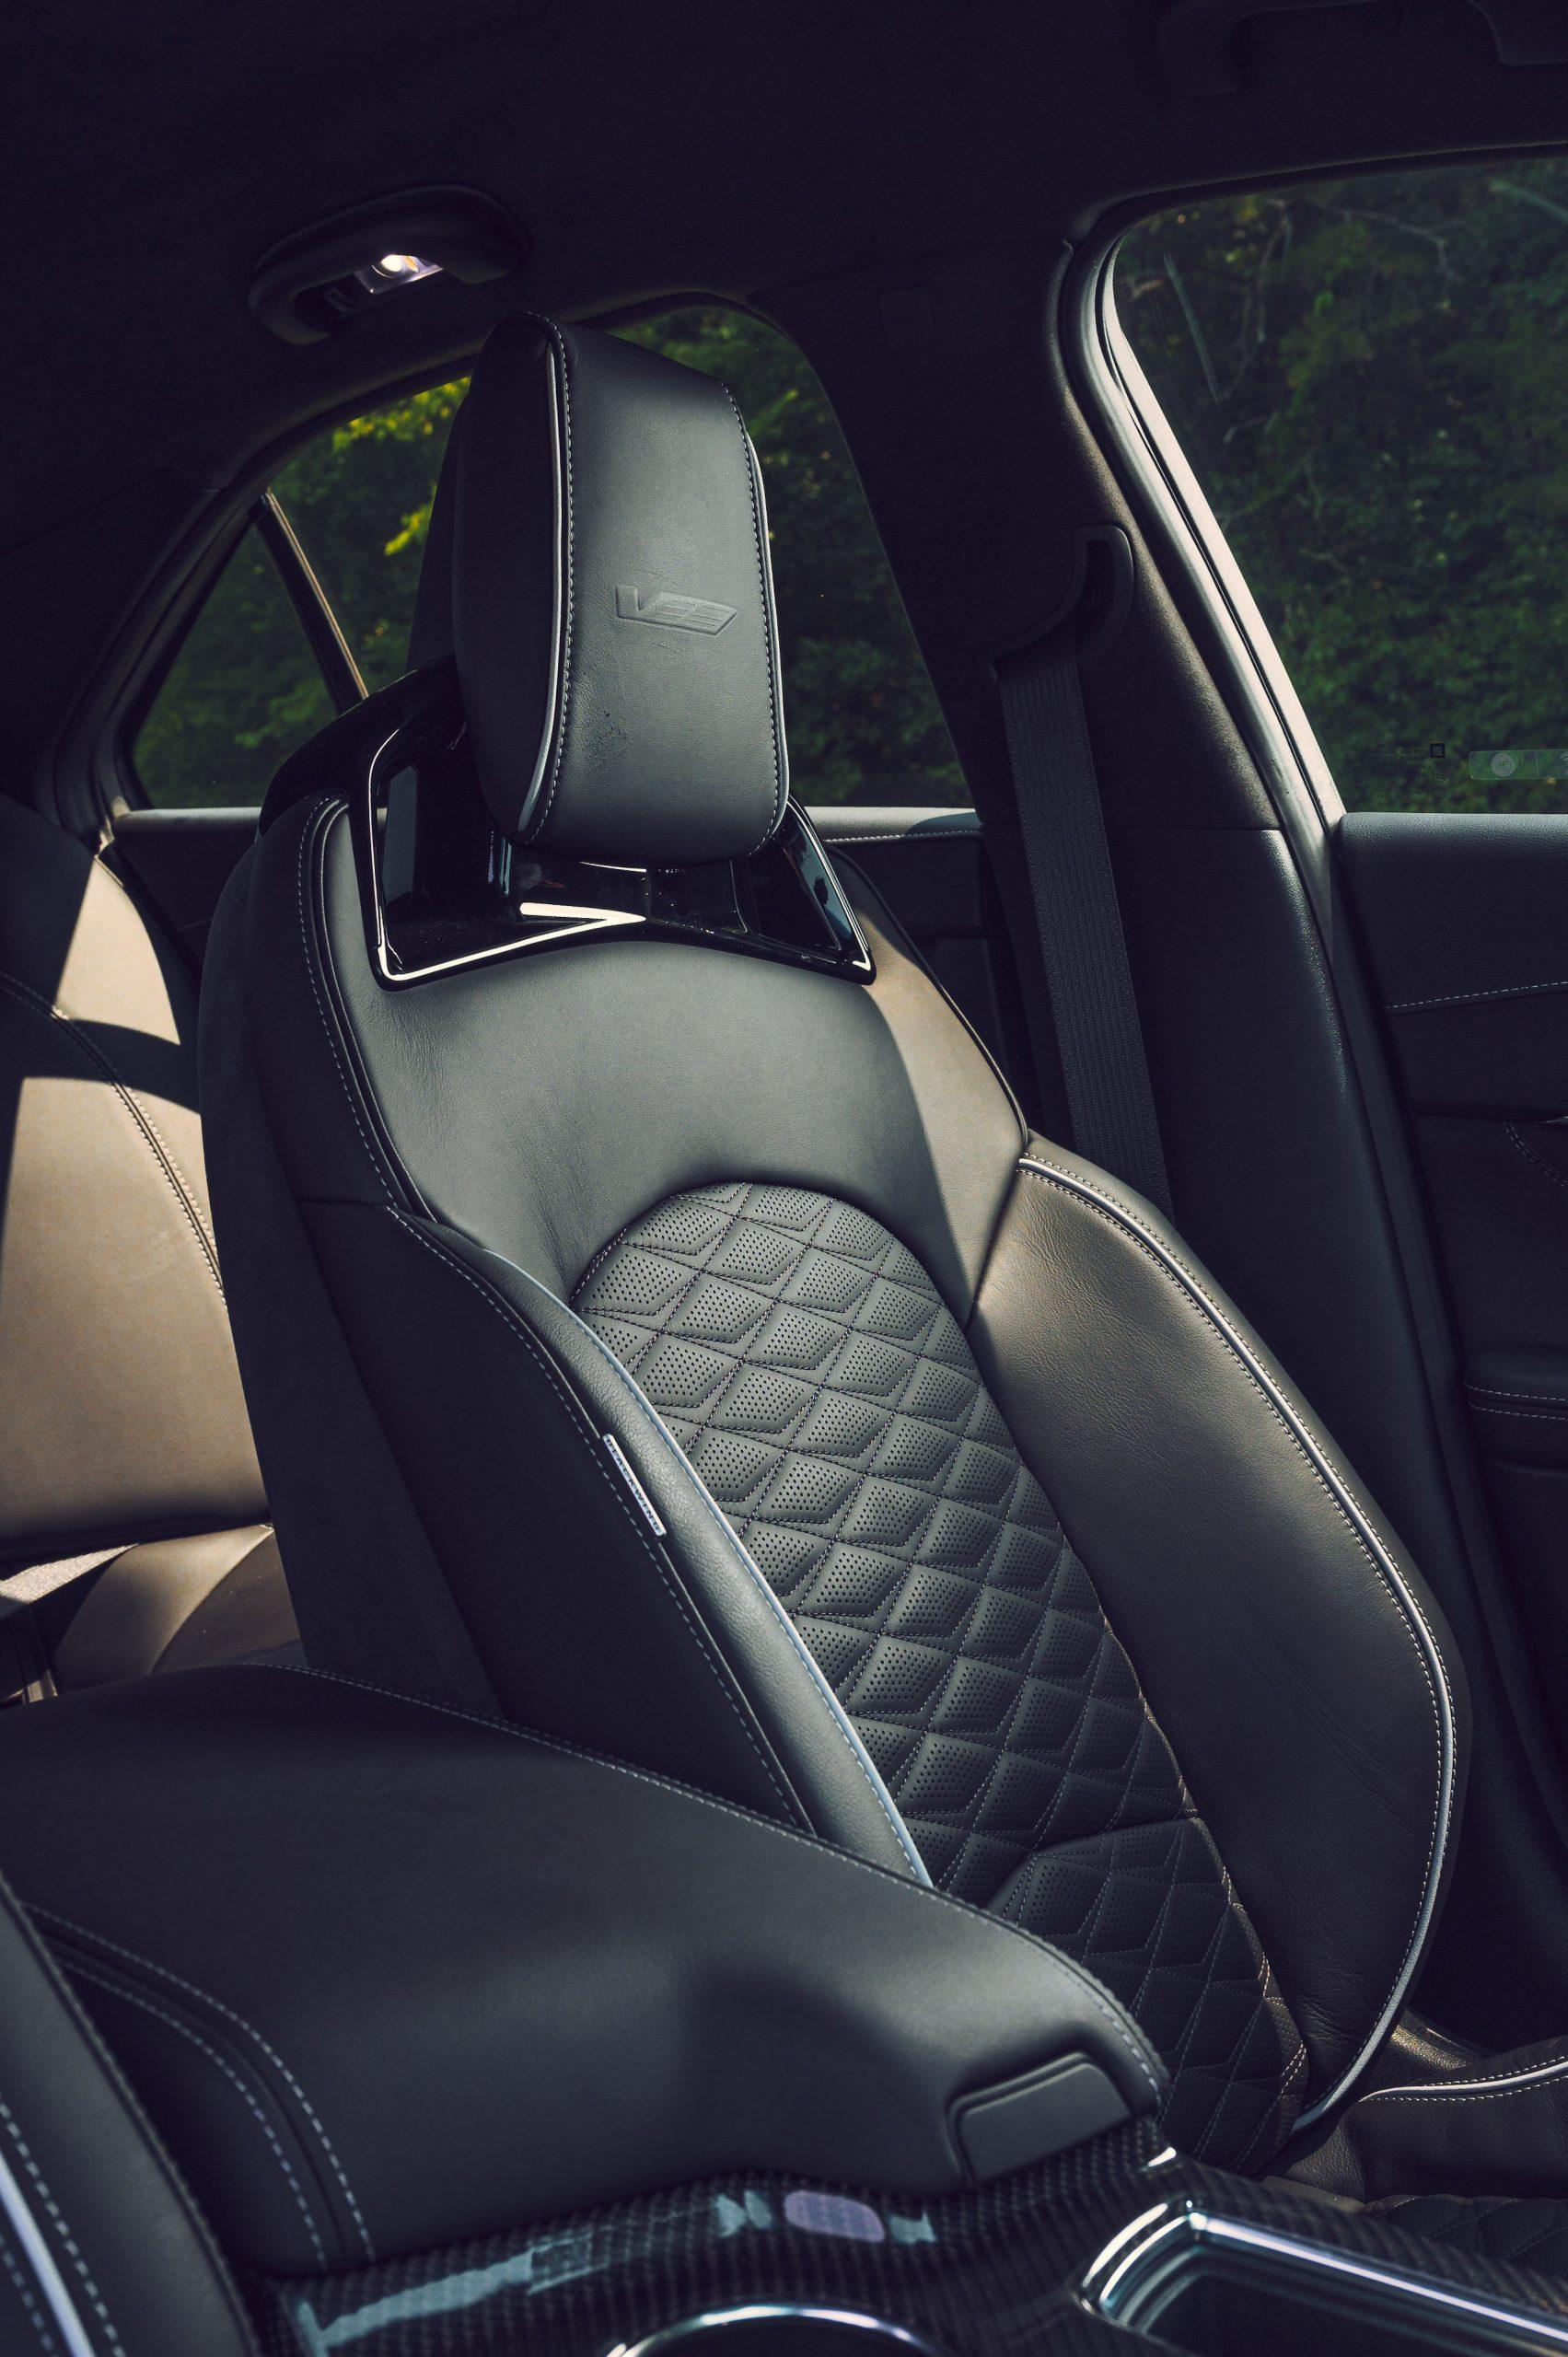 CT4-V Blackwing interior seat